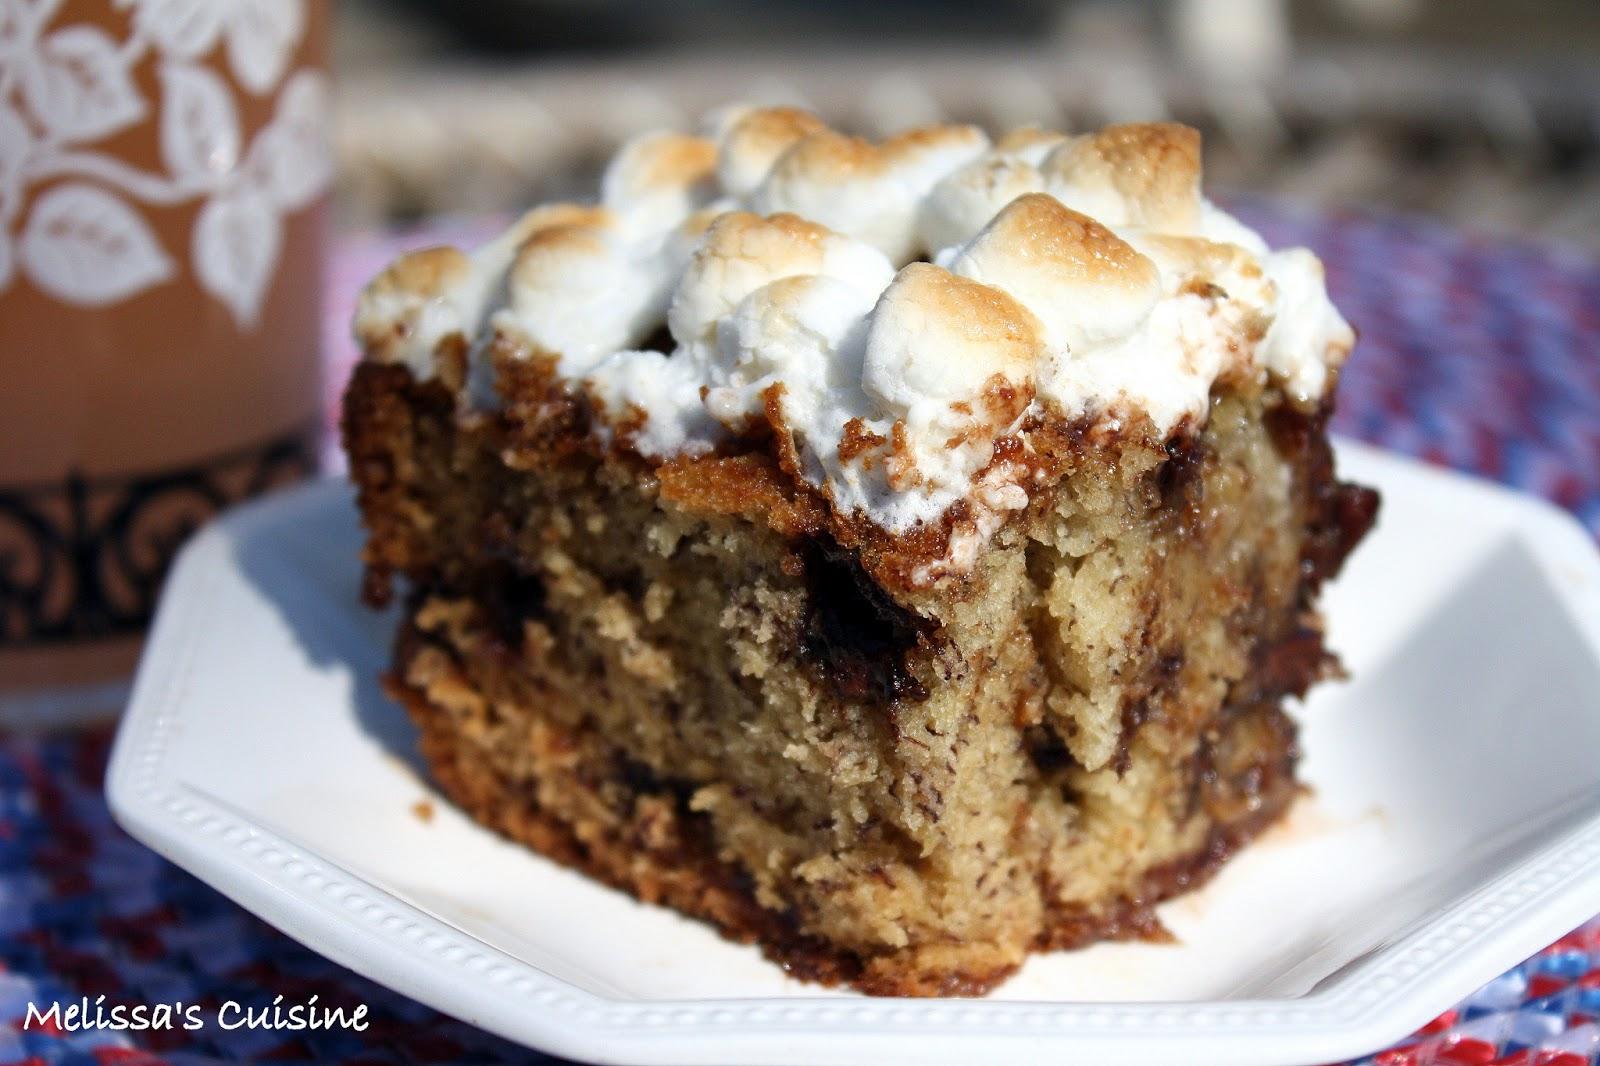 Melissa's Cuisine: S'mores Banana Bread Cake